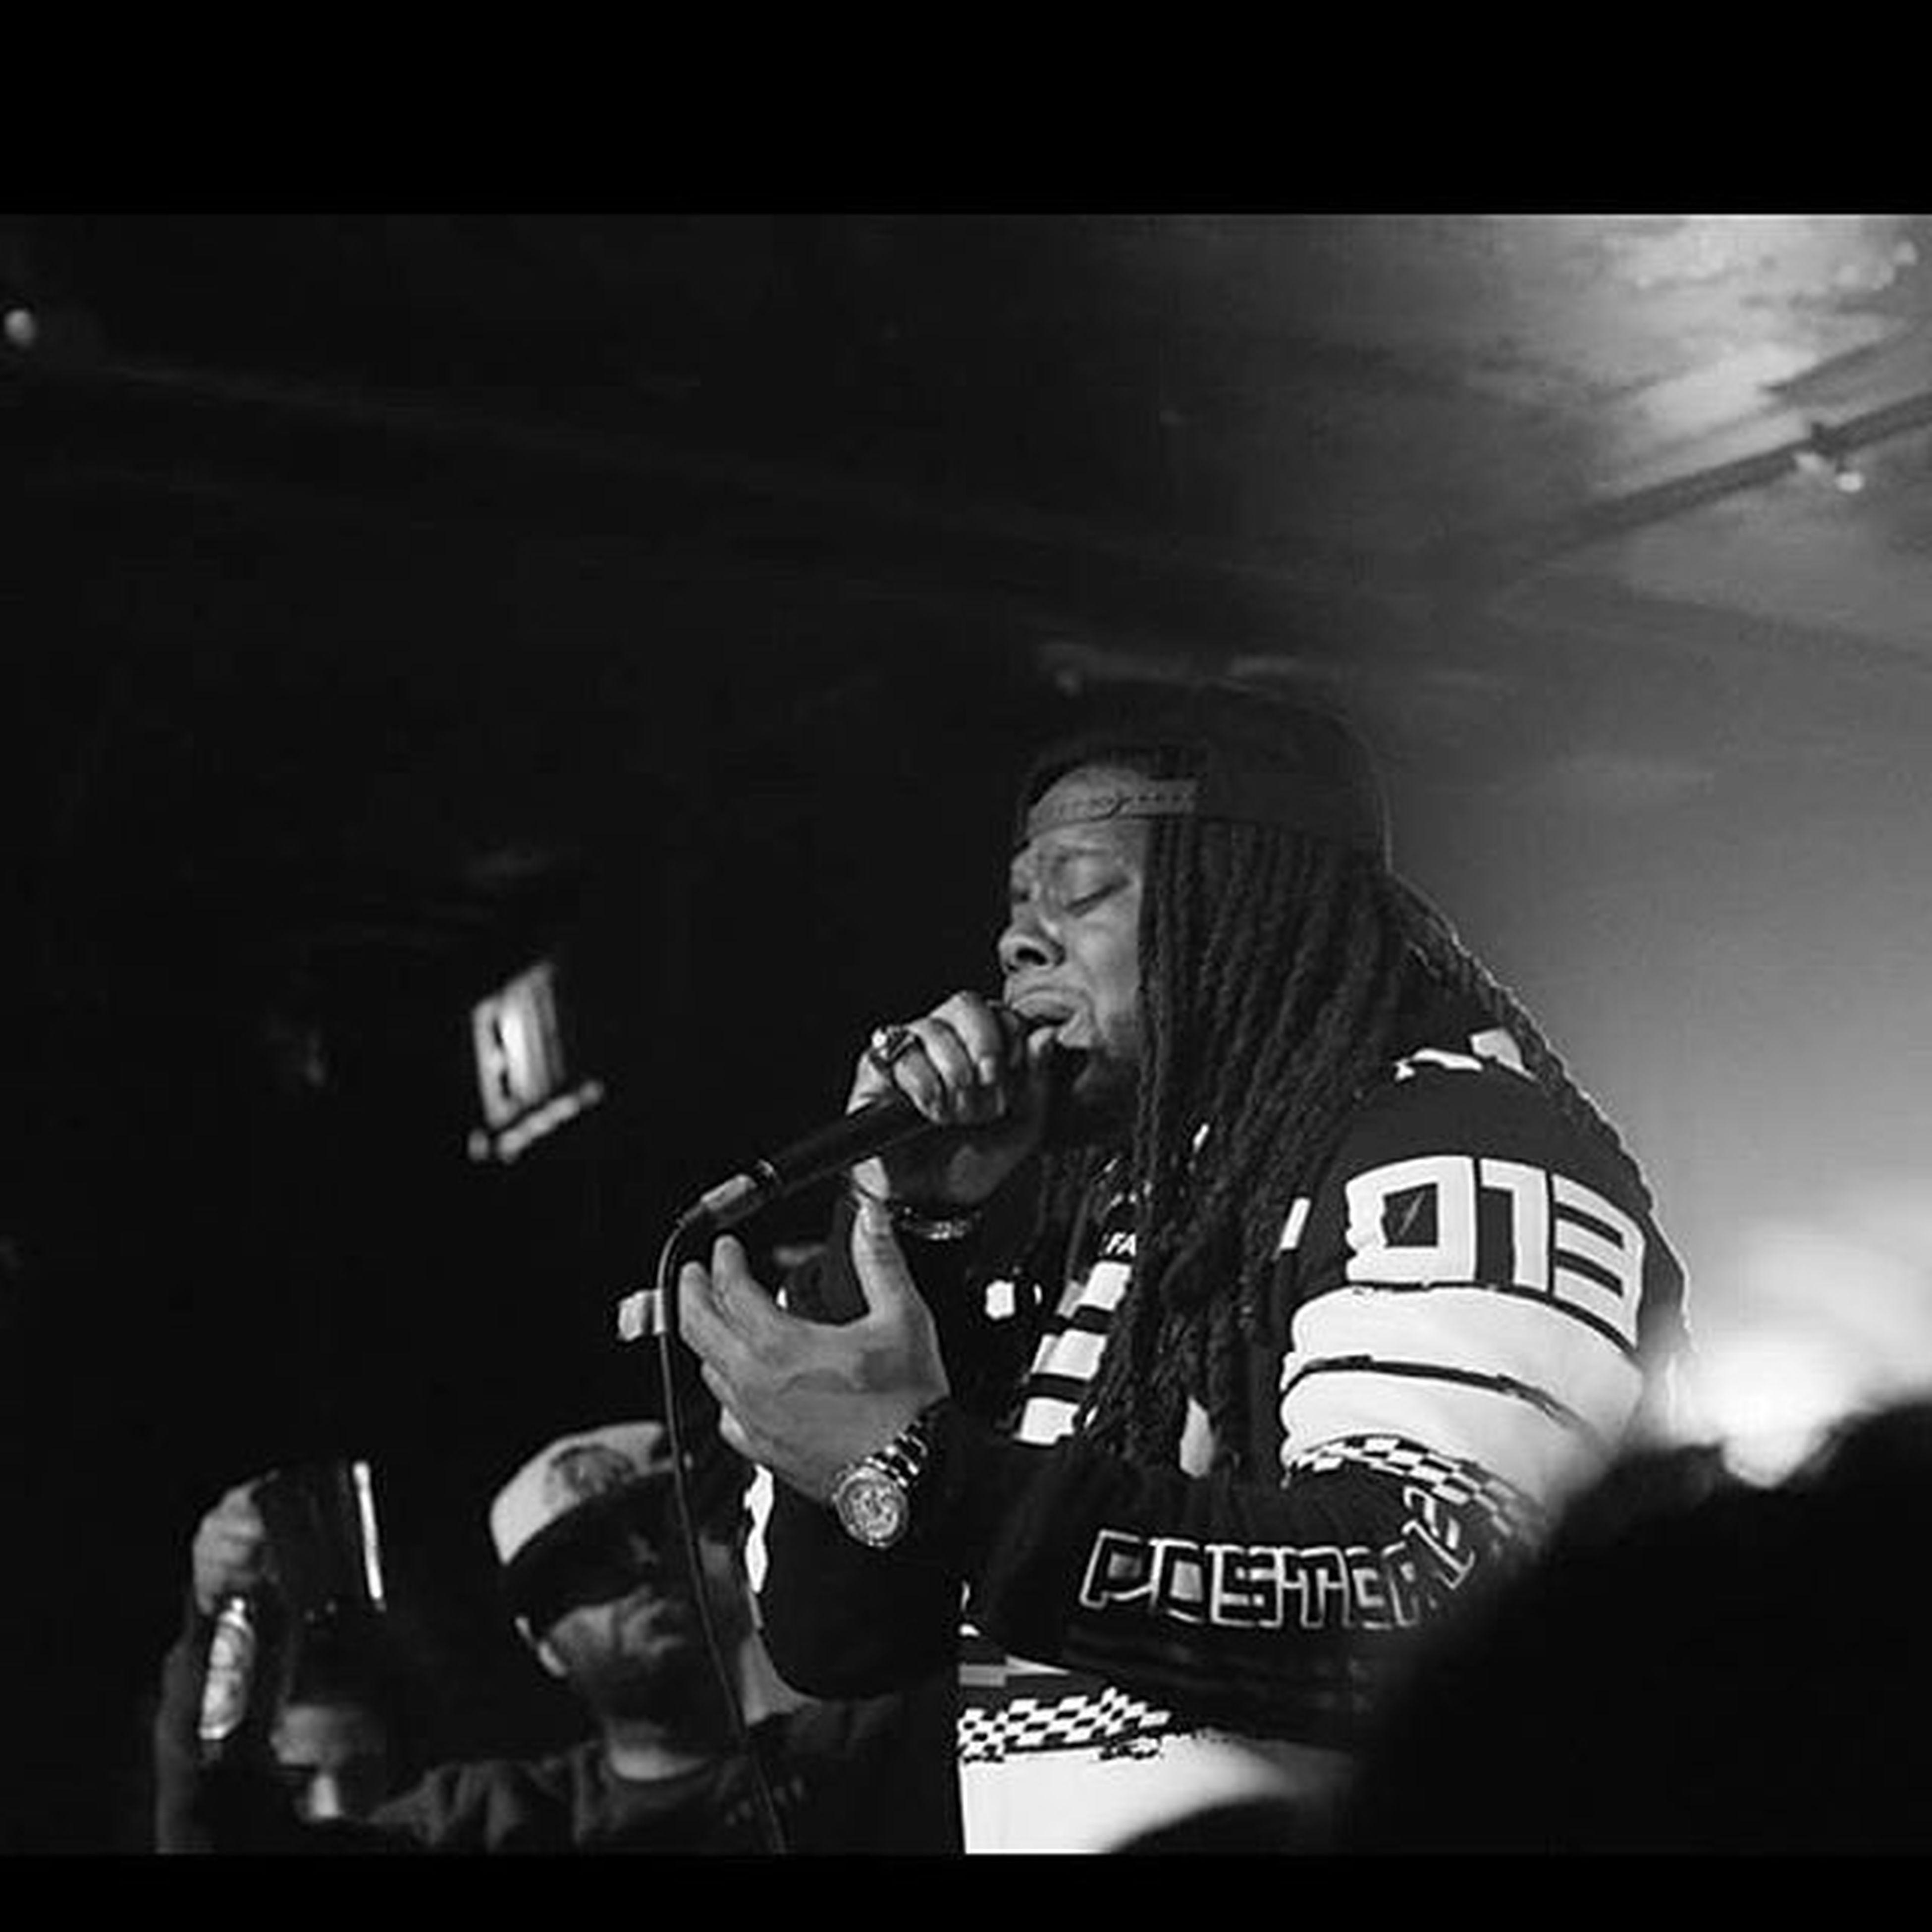 Kinglouie Chicago Drillgod Rap rapper hiphop blackandwhite blackandwhitephotography monochrome monochromephotography instablackandwhite instagood photo snapshot picture composition life pic capture photogram picoftheday pics photooftheday photodaily instagram instalove follow show complexmag